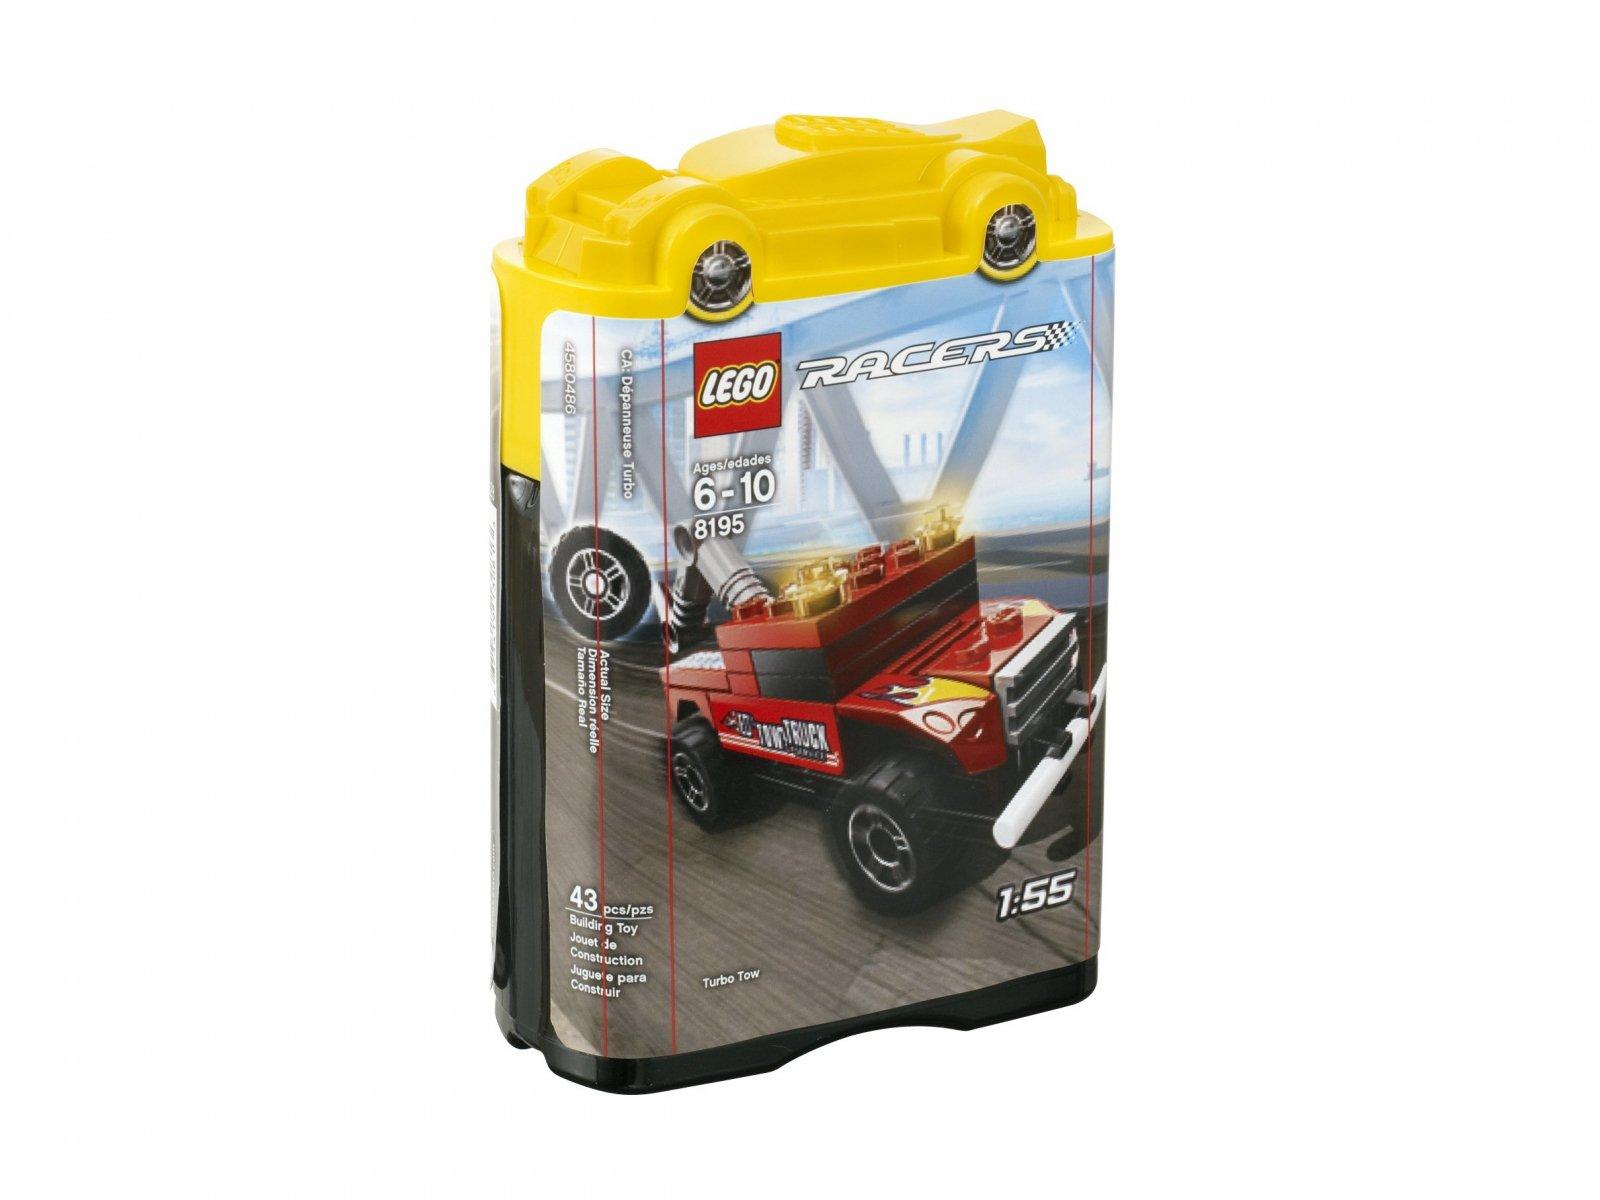 LEGO 8195 Racers Turbo Holownik